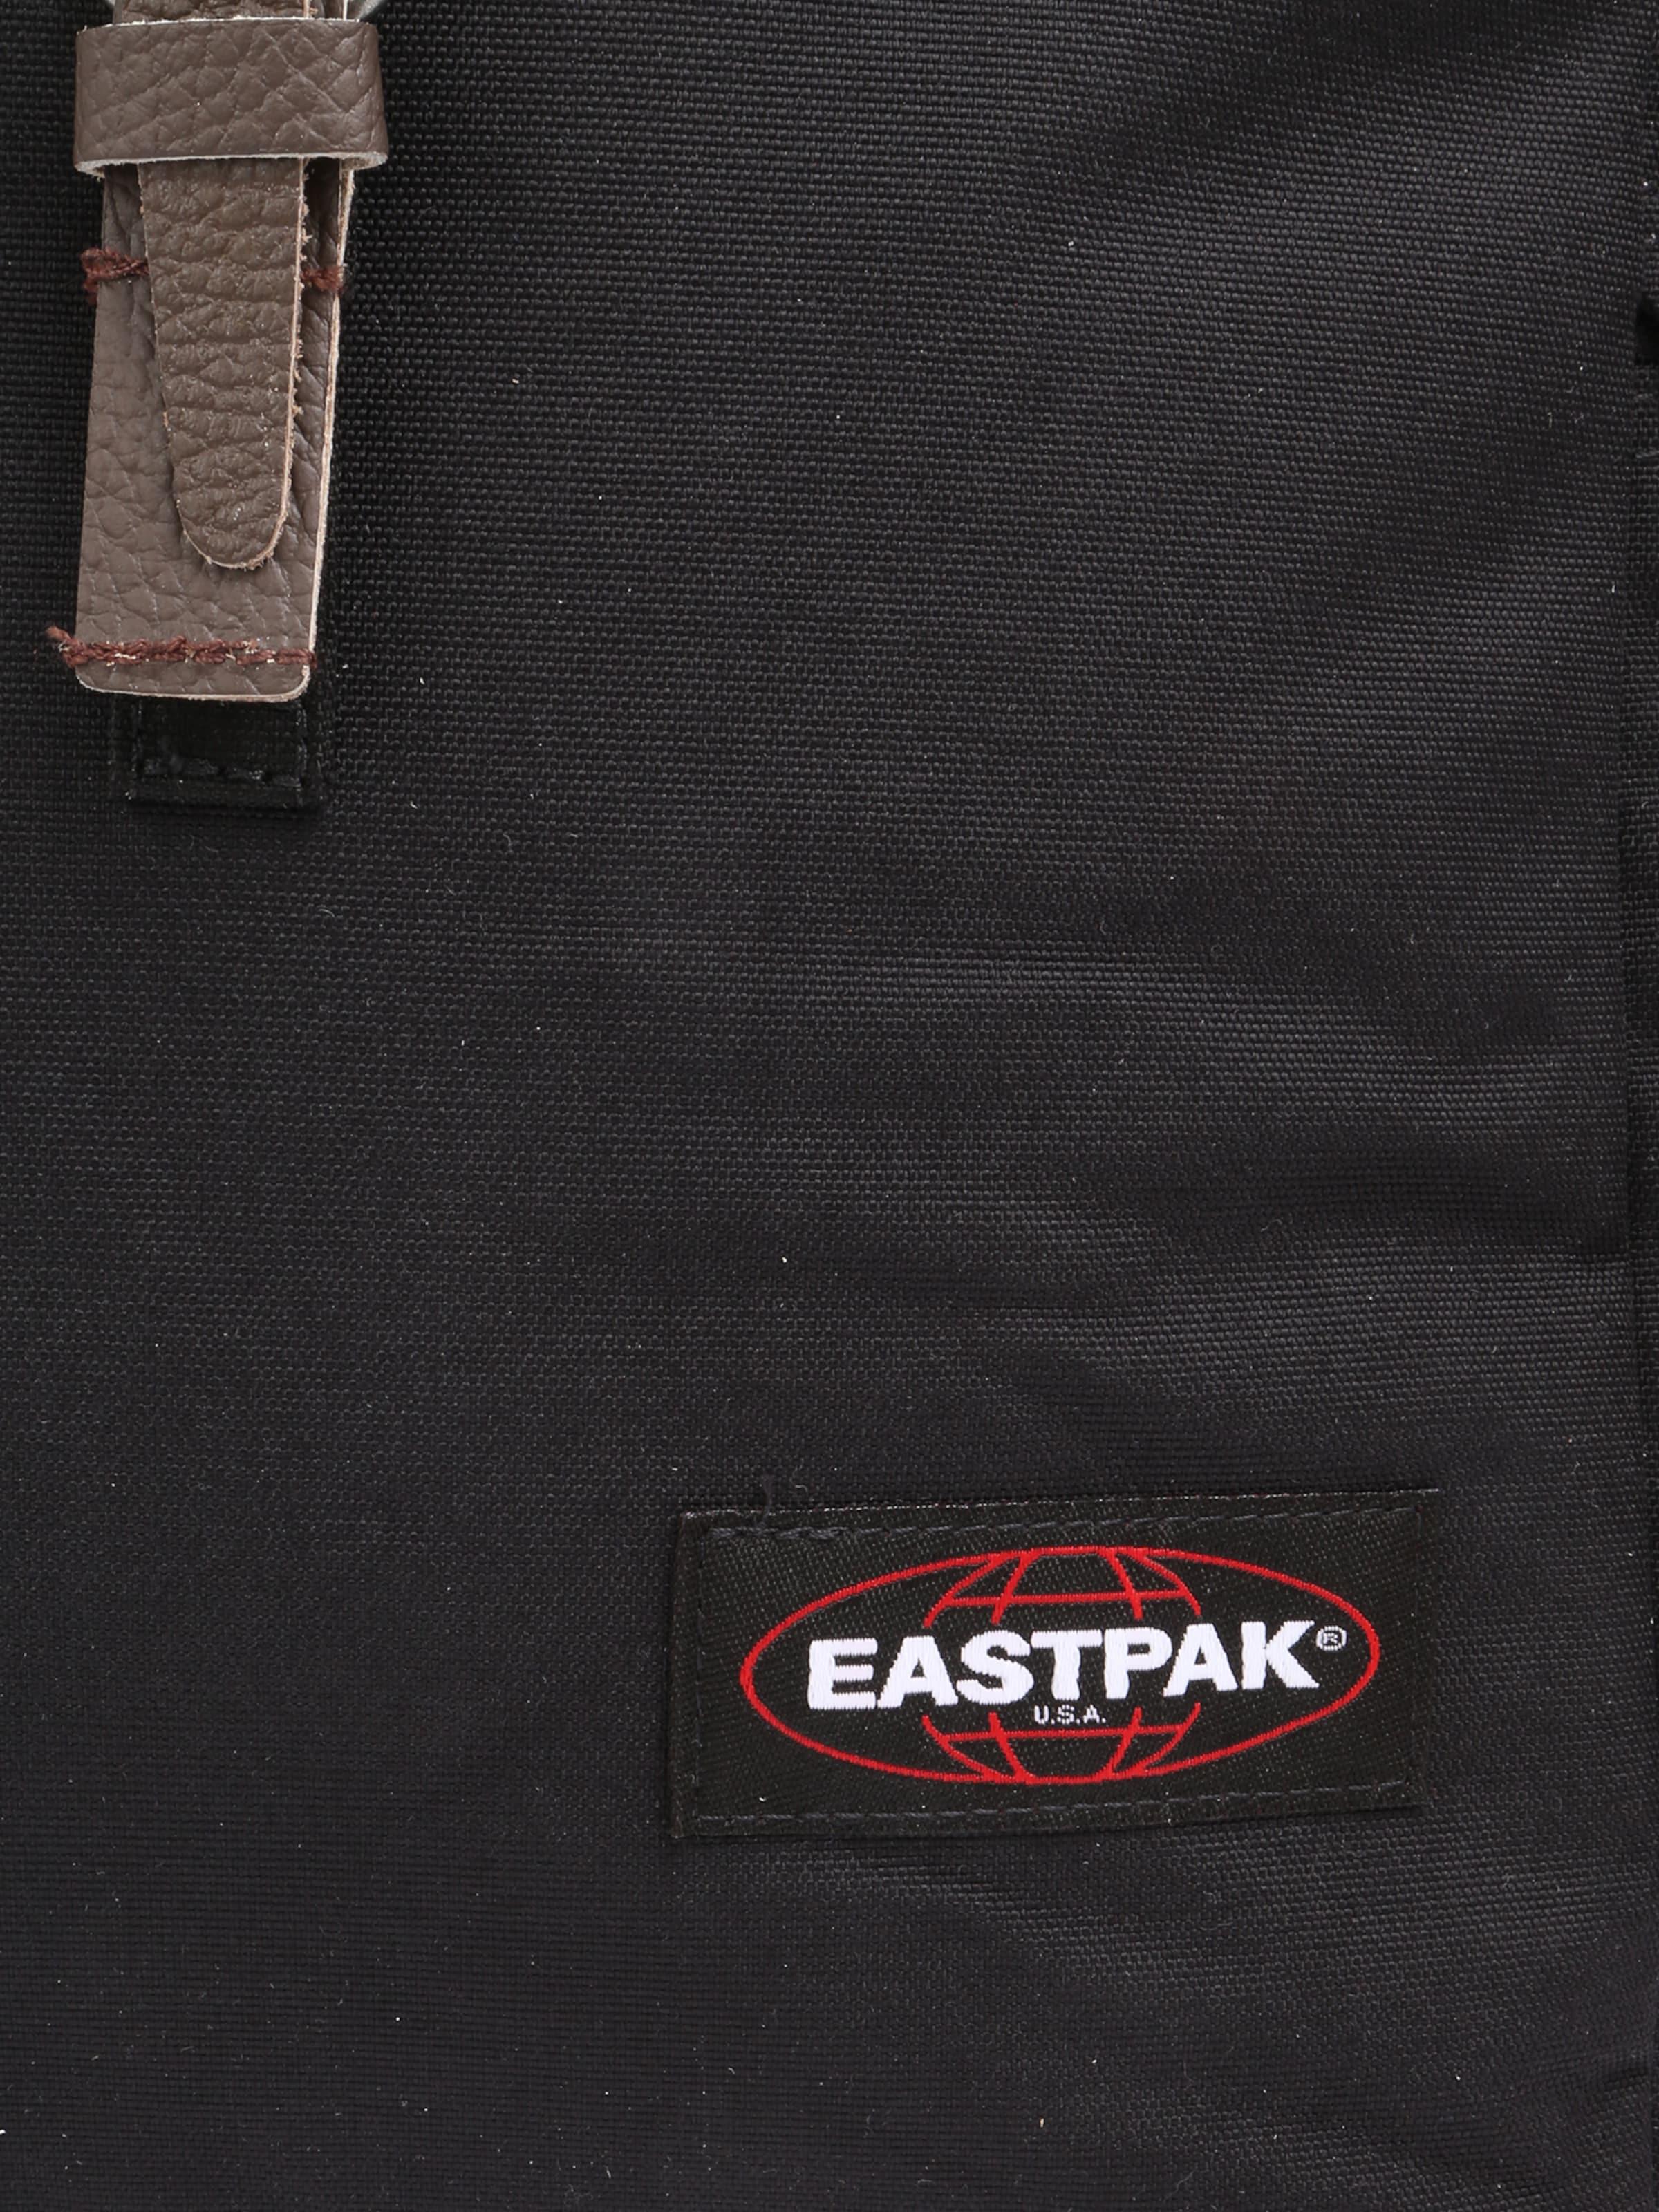 EASTPAK 'AUSTIN' l 18 18 Rucksack EASTPAK 'AUSTIN' Rucksack r0wrnU6XF